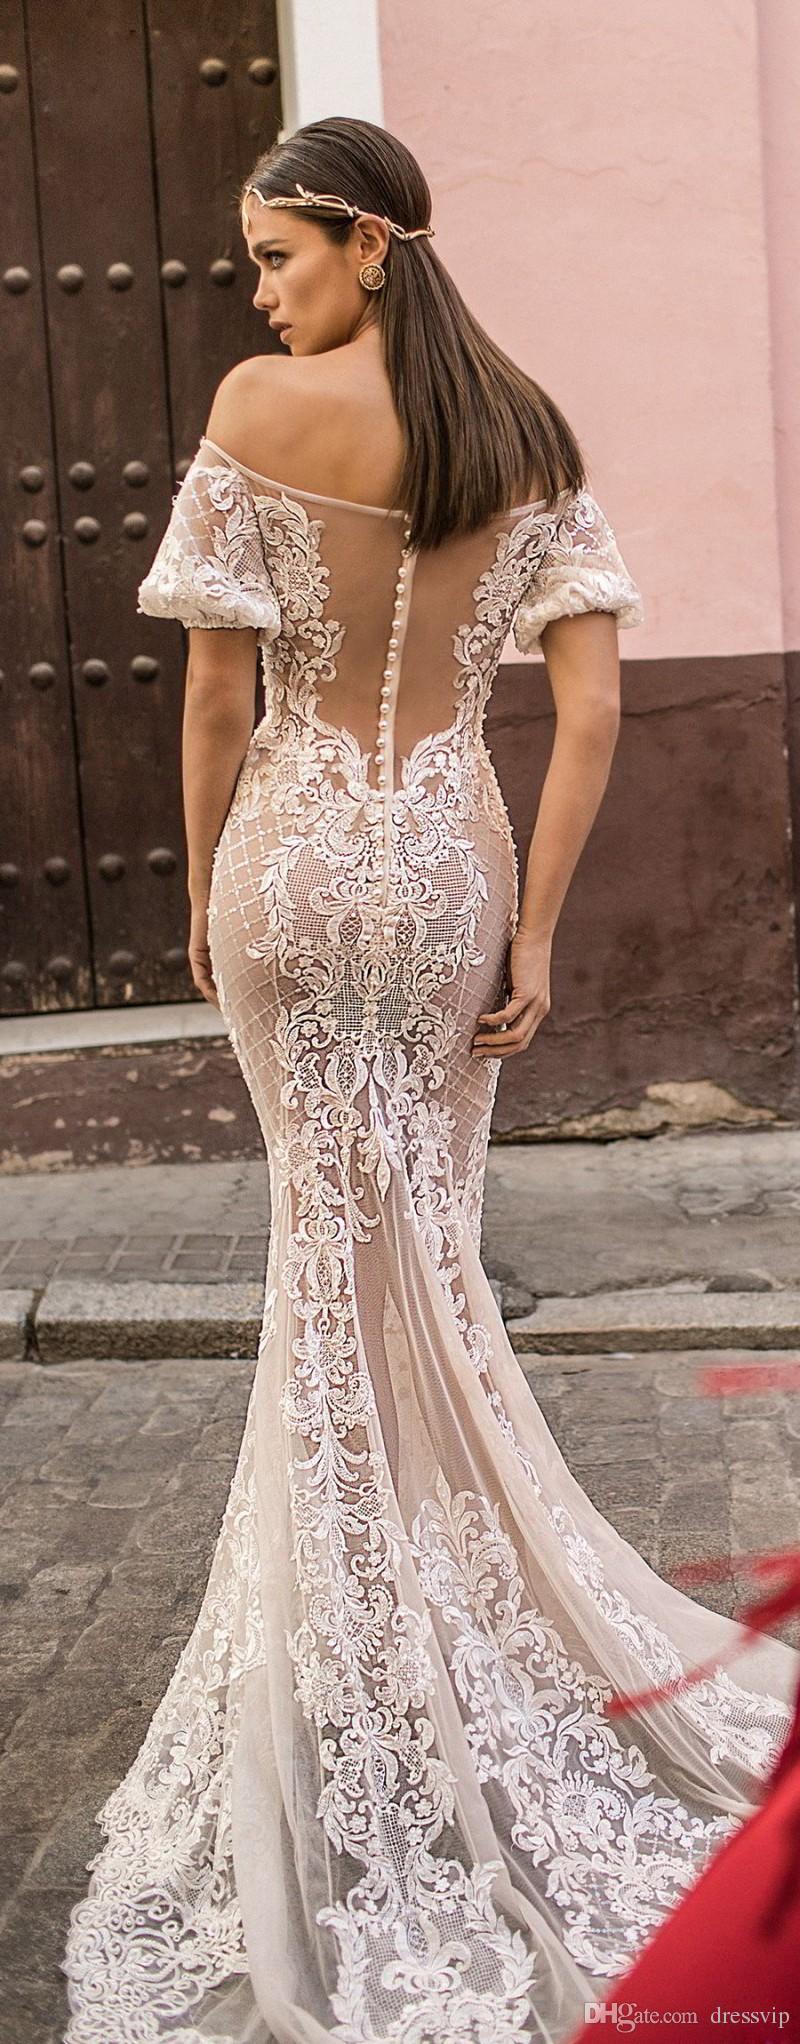 2018 Berta Mermaid Wedding Dresses Off Shoulder Short Sleeve Lace Tulle Applique Beach Wedding Gowns Sexy Plus Size Boho Bridal Dress